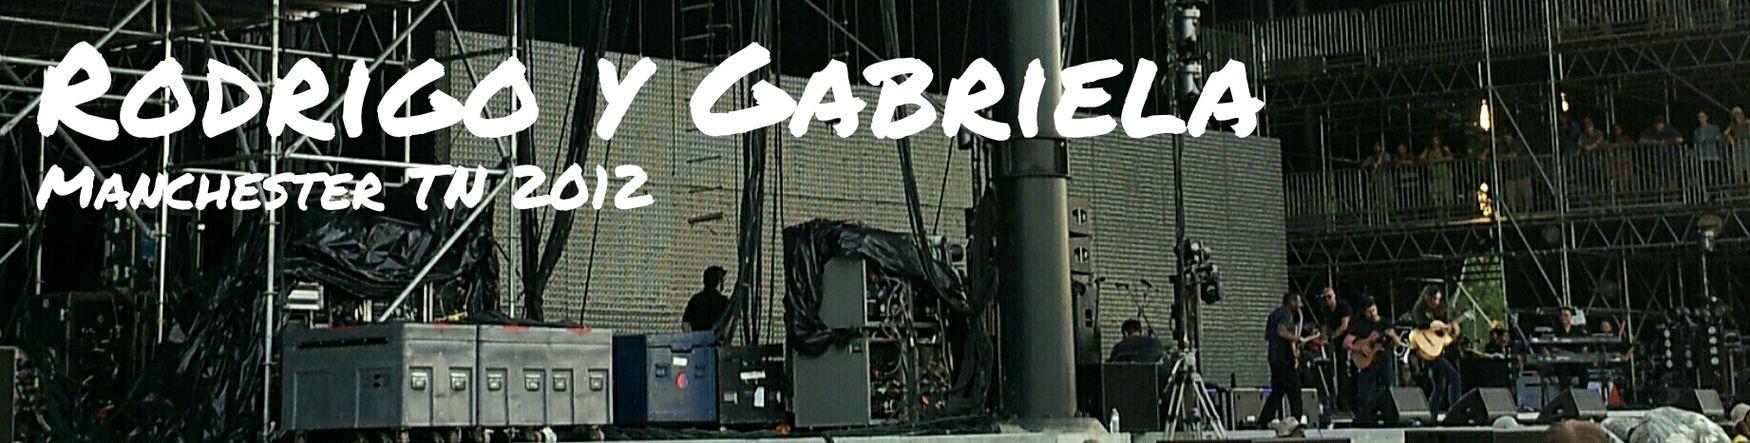 Rodrigo y Gabriela Check This Out Music Eyeem Shows Taking Photos